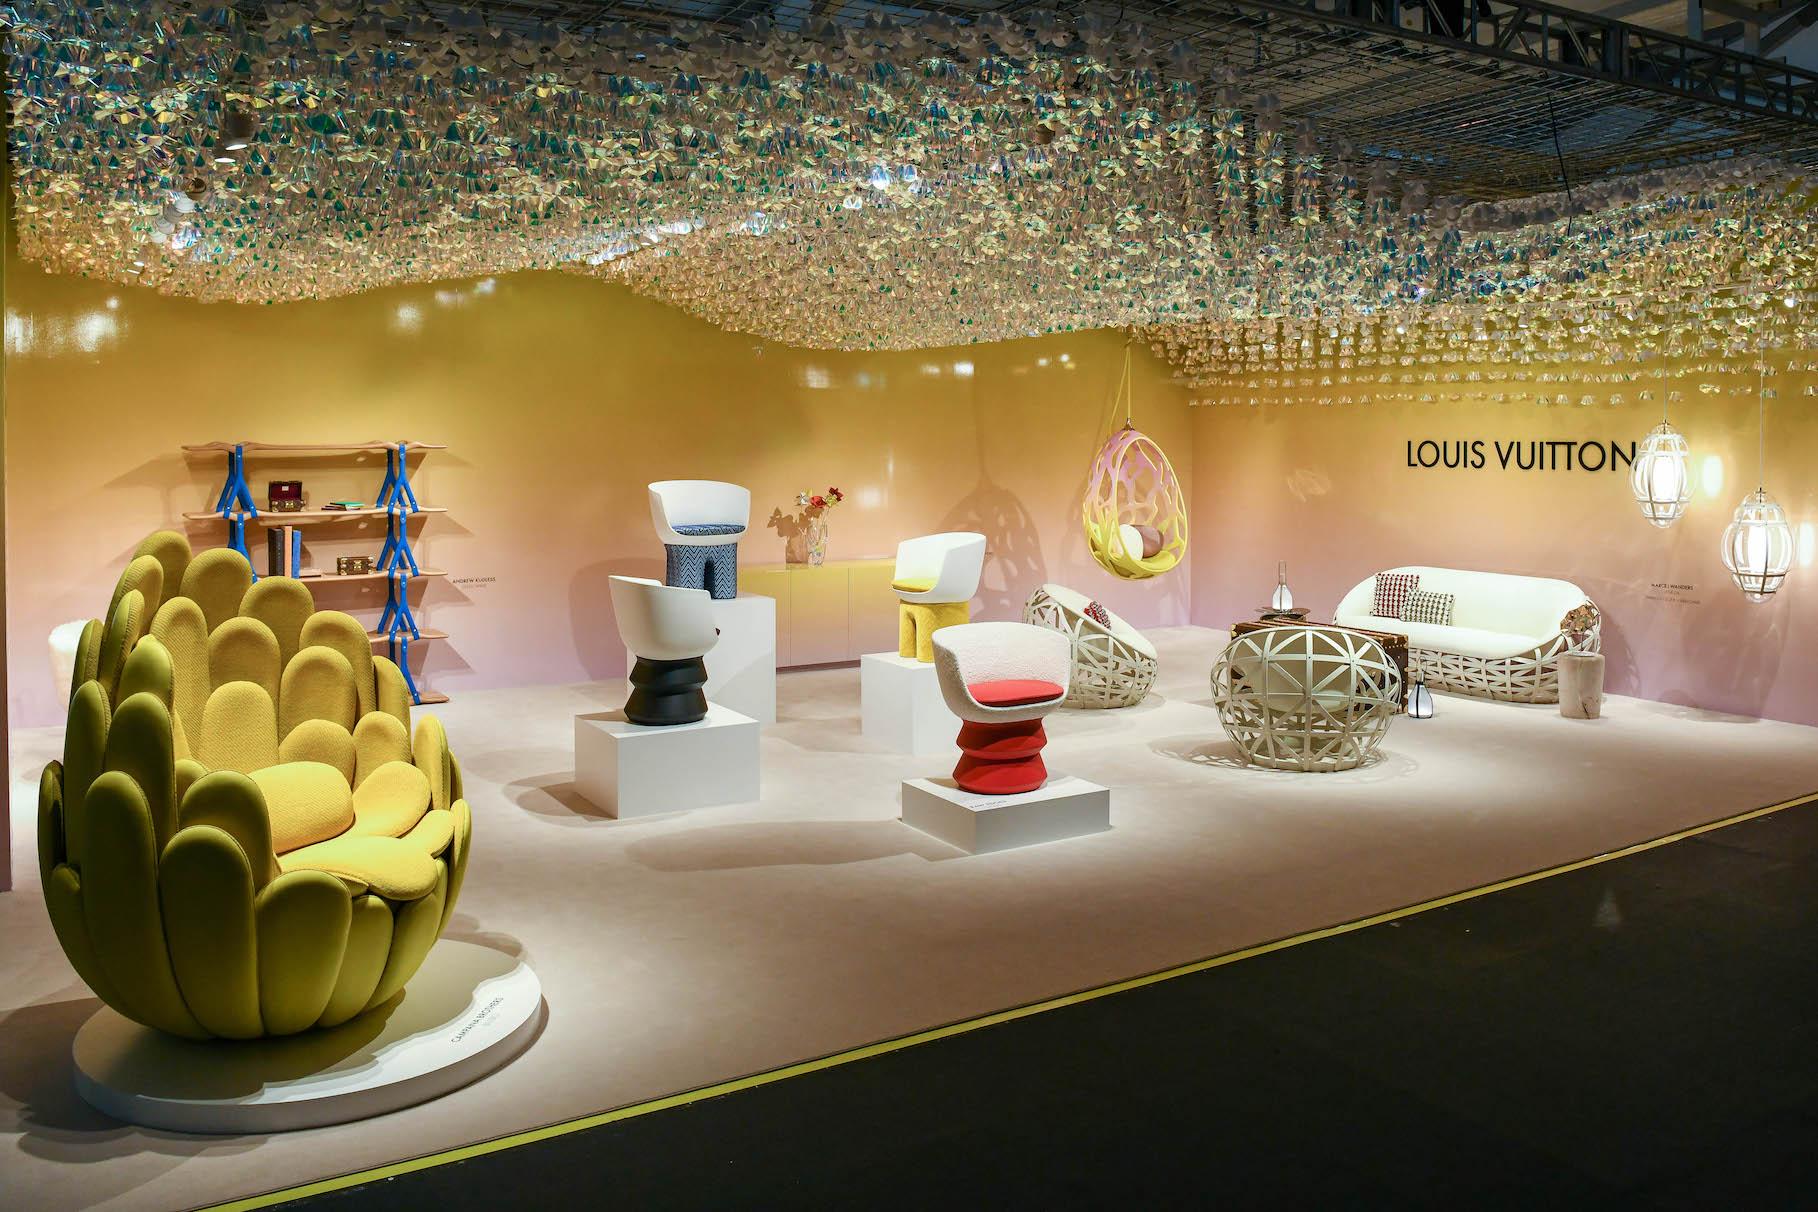 Louis Vuitton、デザイン・マイアミで「オブジェ・ノマド」新作披露